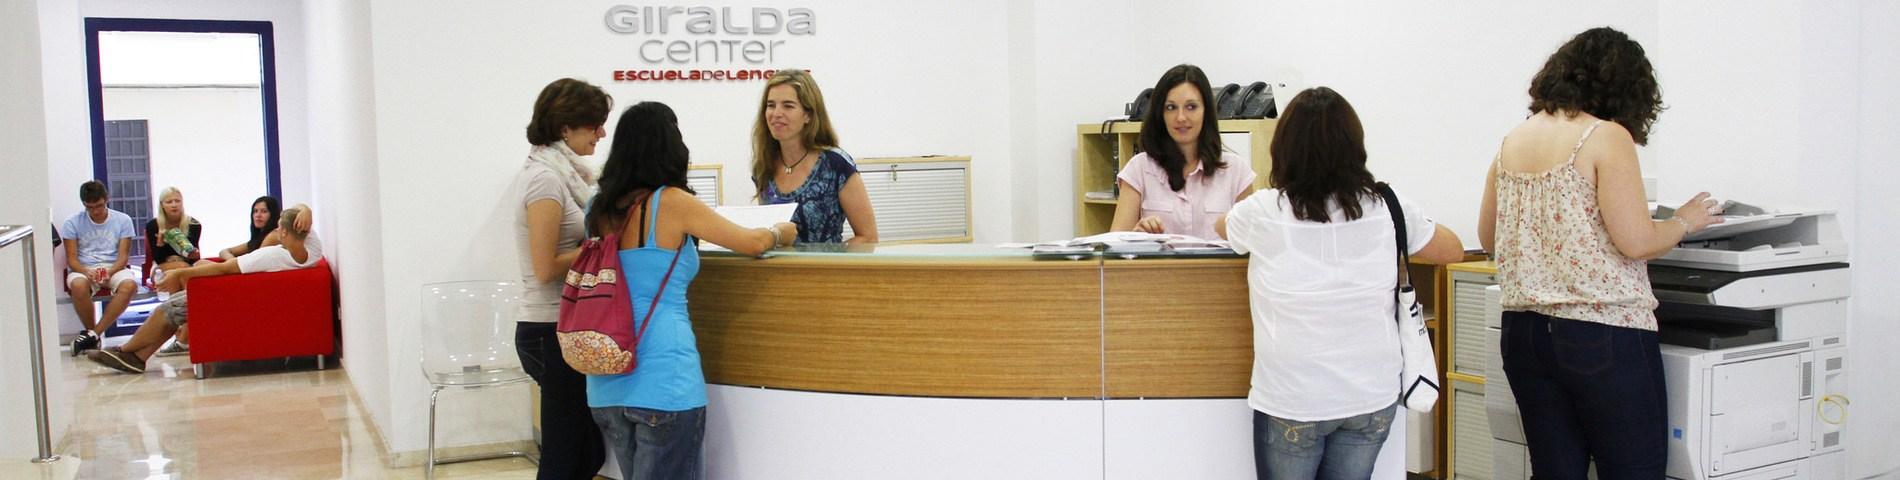 Giralda Center - Spanish House billede 1